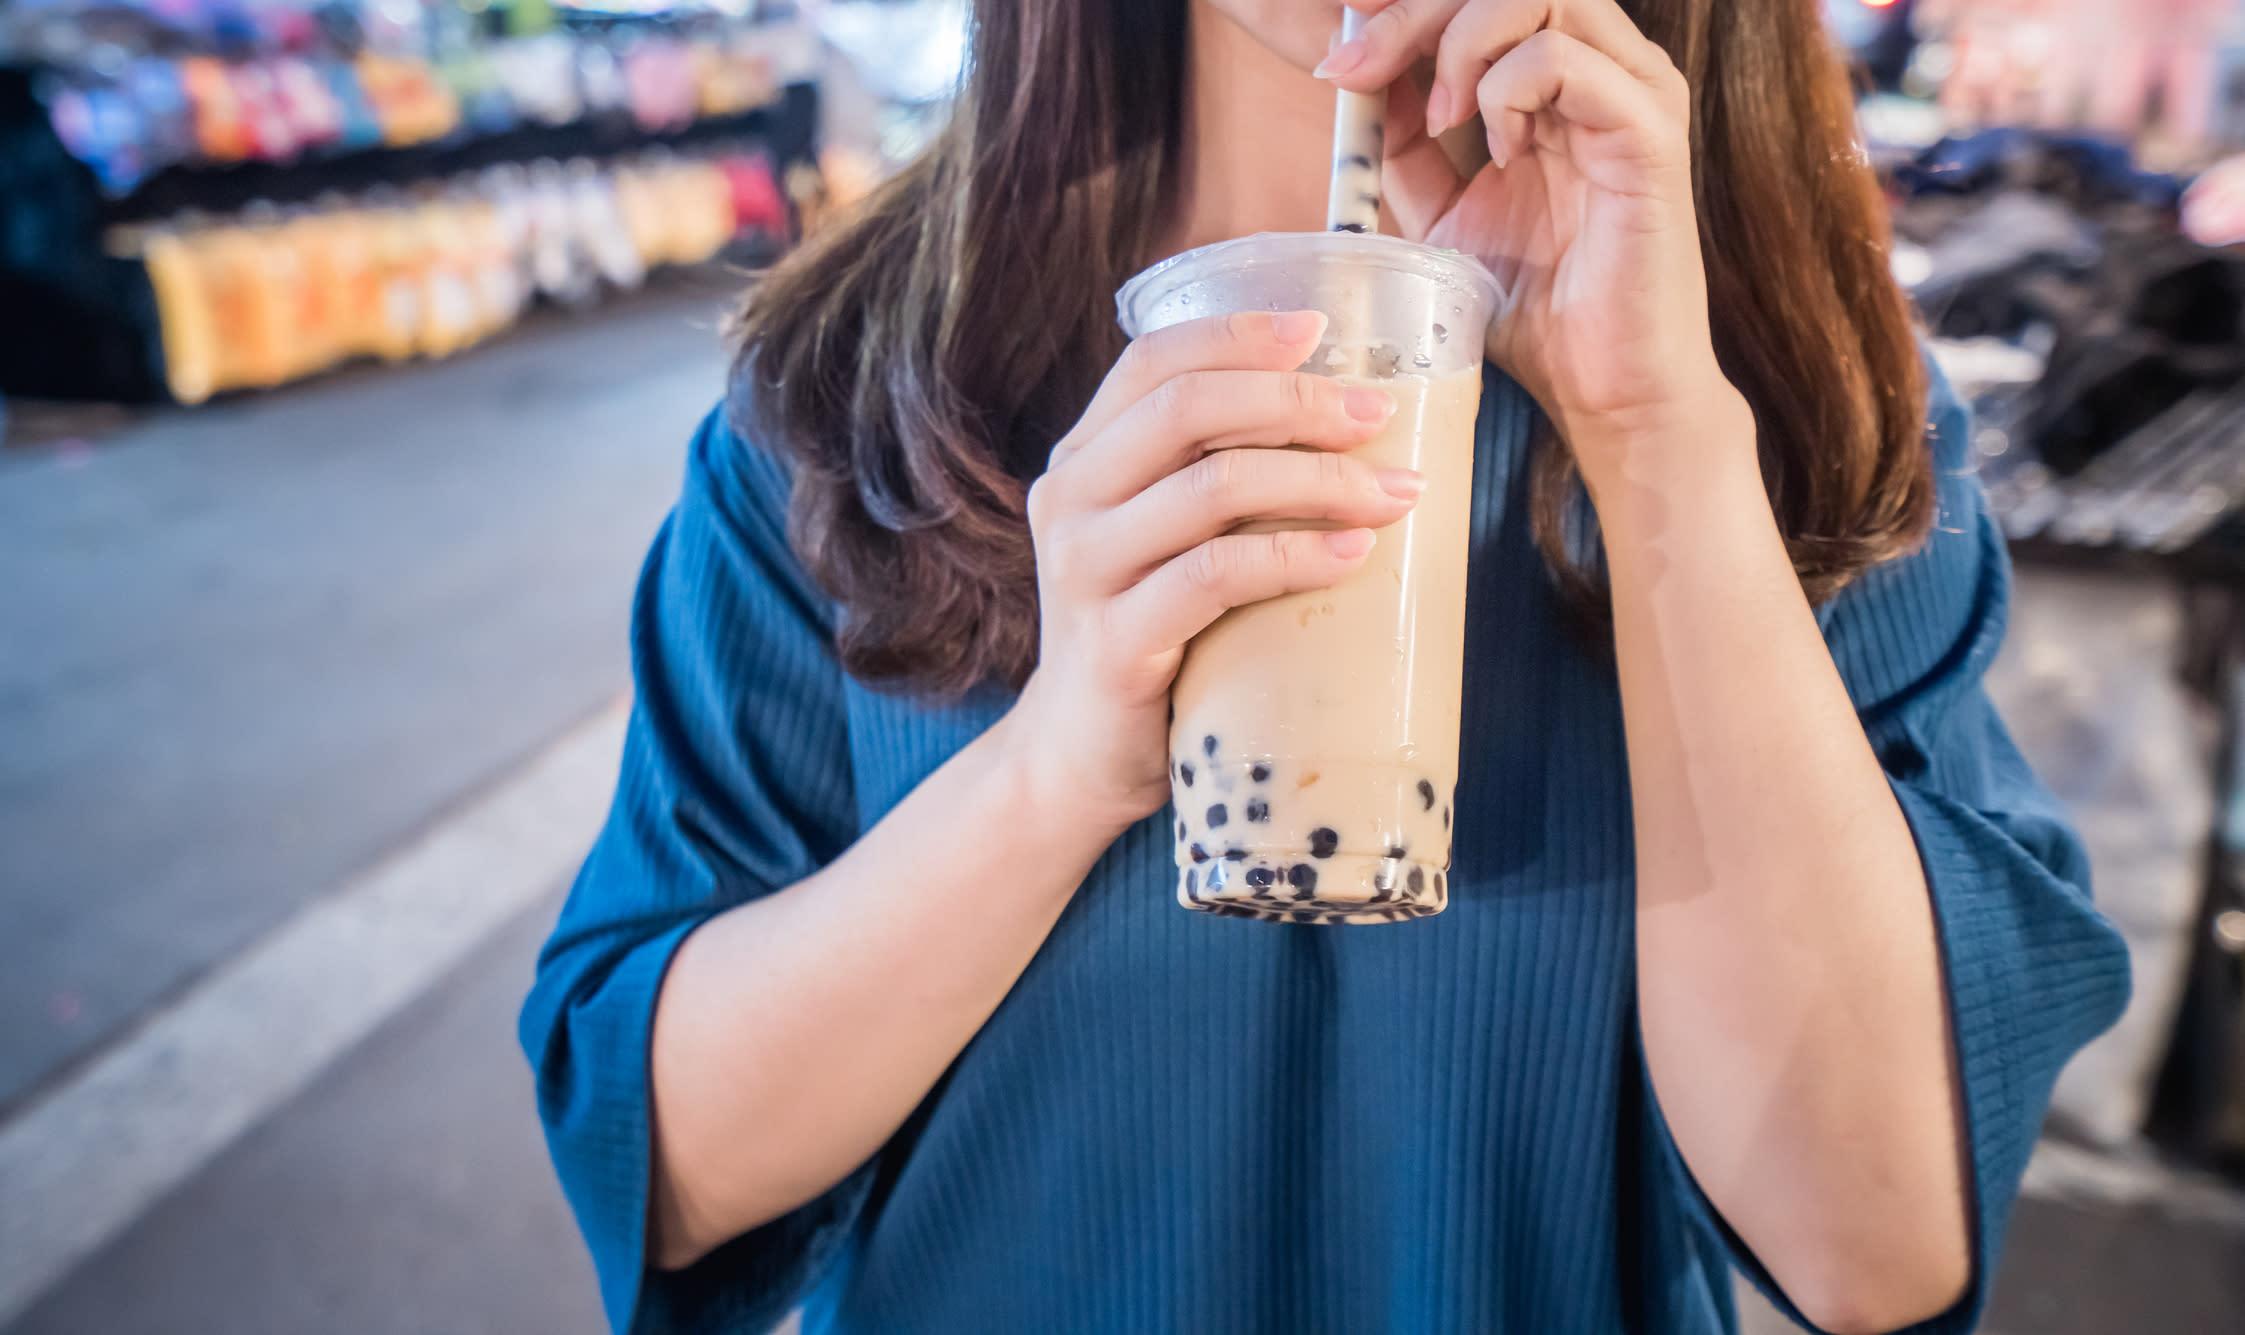 How bad is bubble tea?